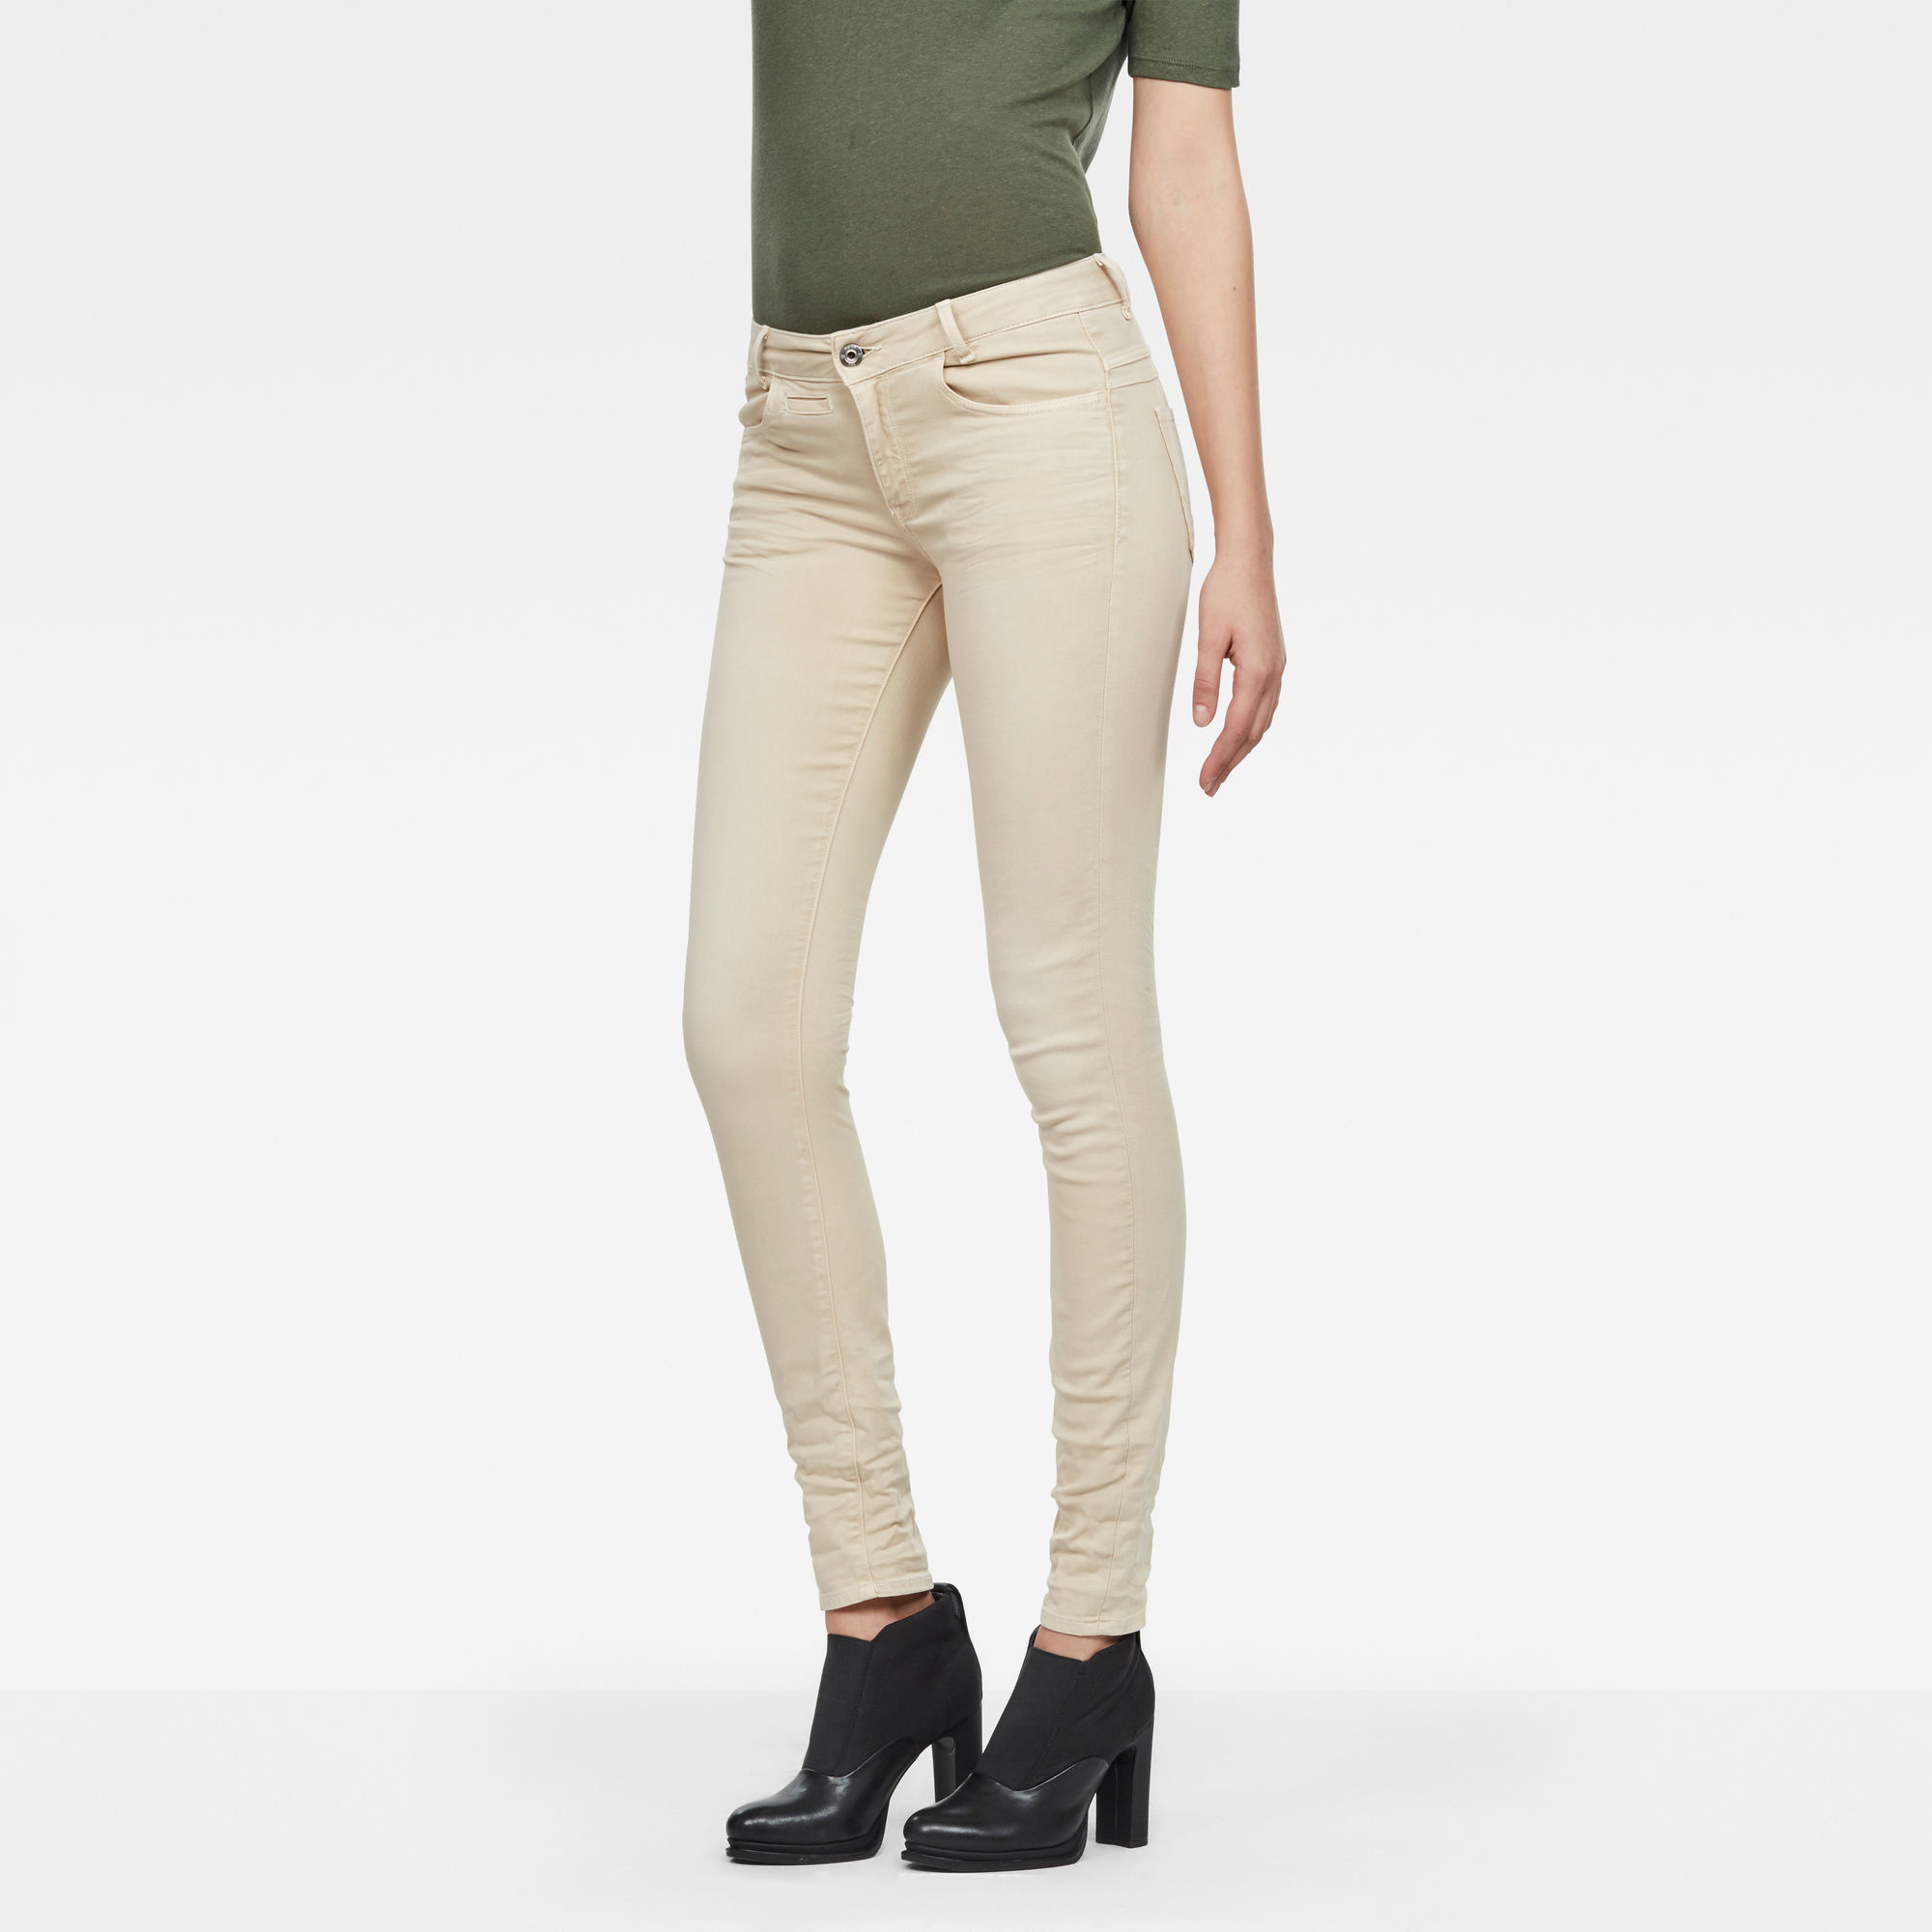 D-Staq 5-Pocket Mid waist Skinny Color Jeans